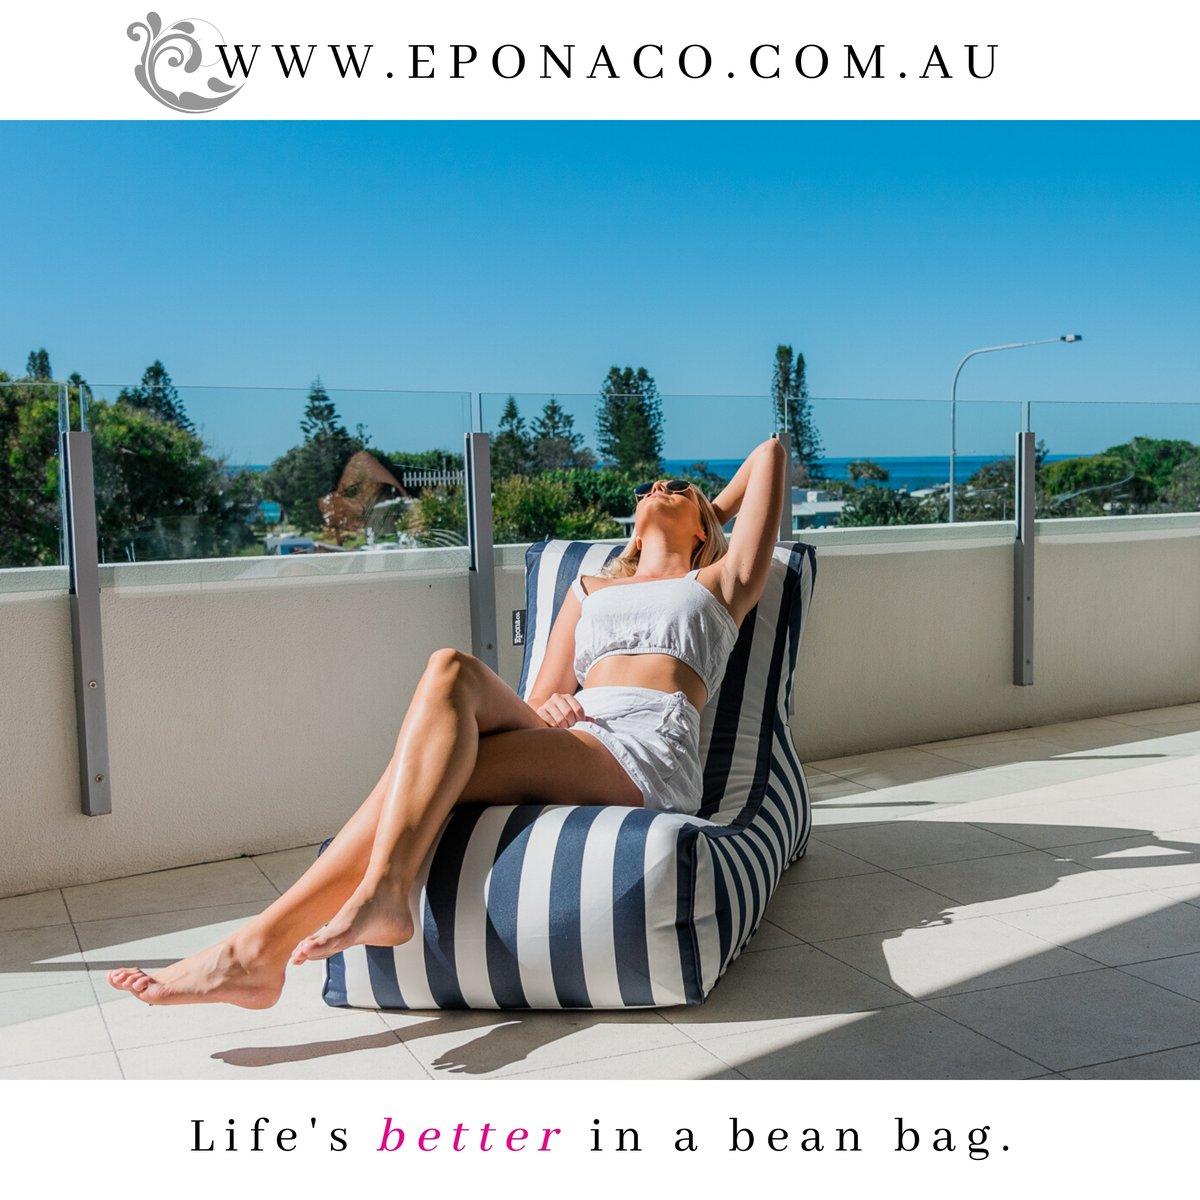 Life's better in a bean bag! #trending #beanbag #furnituredesign #designinspiration #fashion #shoppingonline #giftideas #interiordesign #outdoorliving #lifestyle #travel #comfort #relax #Eponaco #beachlife #poolparty #fun #resort #luxurylifestyle #luxuryhomes #luxurydesign https://t.co/q09ggNsbSI